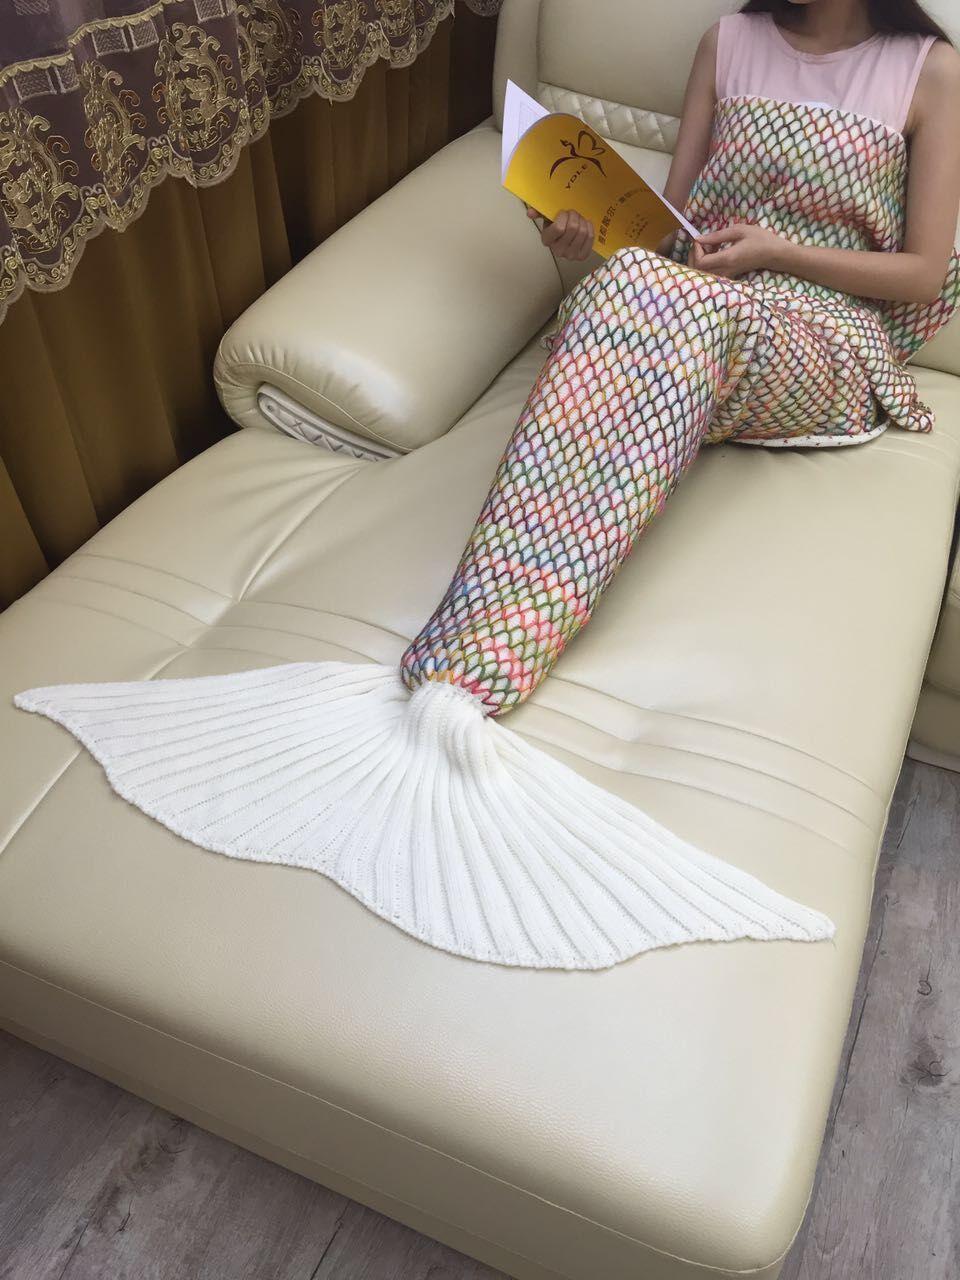 Image 5 - CAMMITEVER Crochet Knitted Mermaid Tail Blanket Super Soft All Season Sleeping Bag For Girls Adults Teens Women Baby Girl Gift-in Blankets from Home & Garden